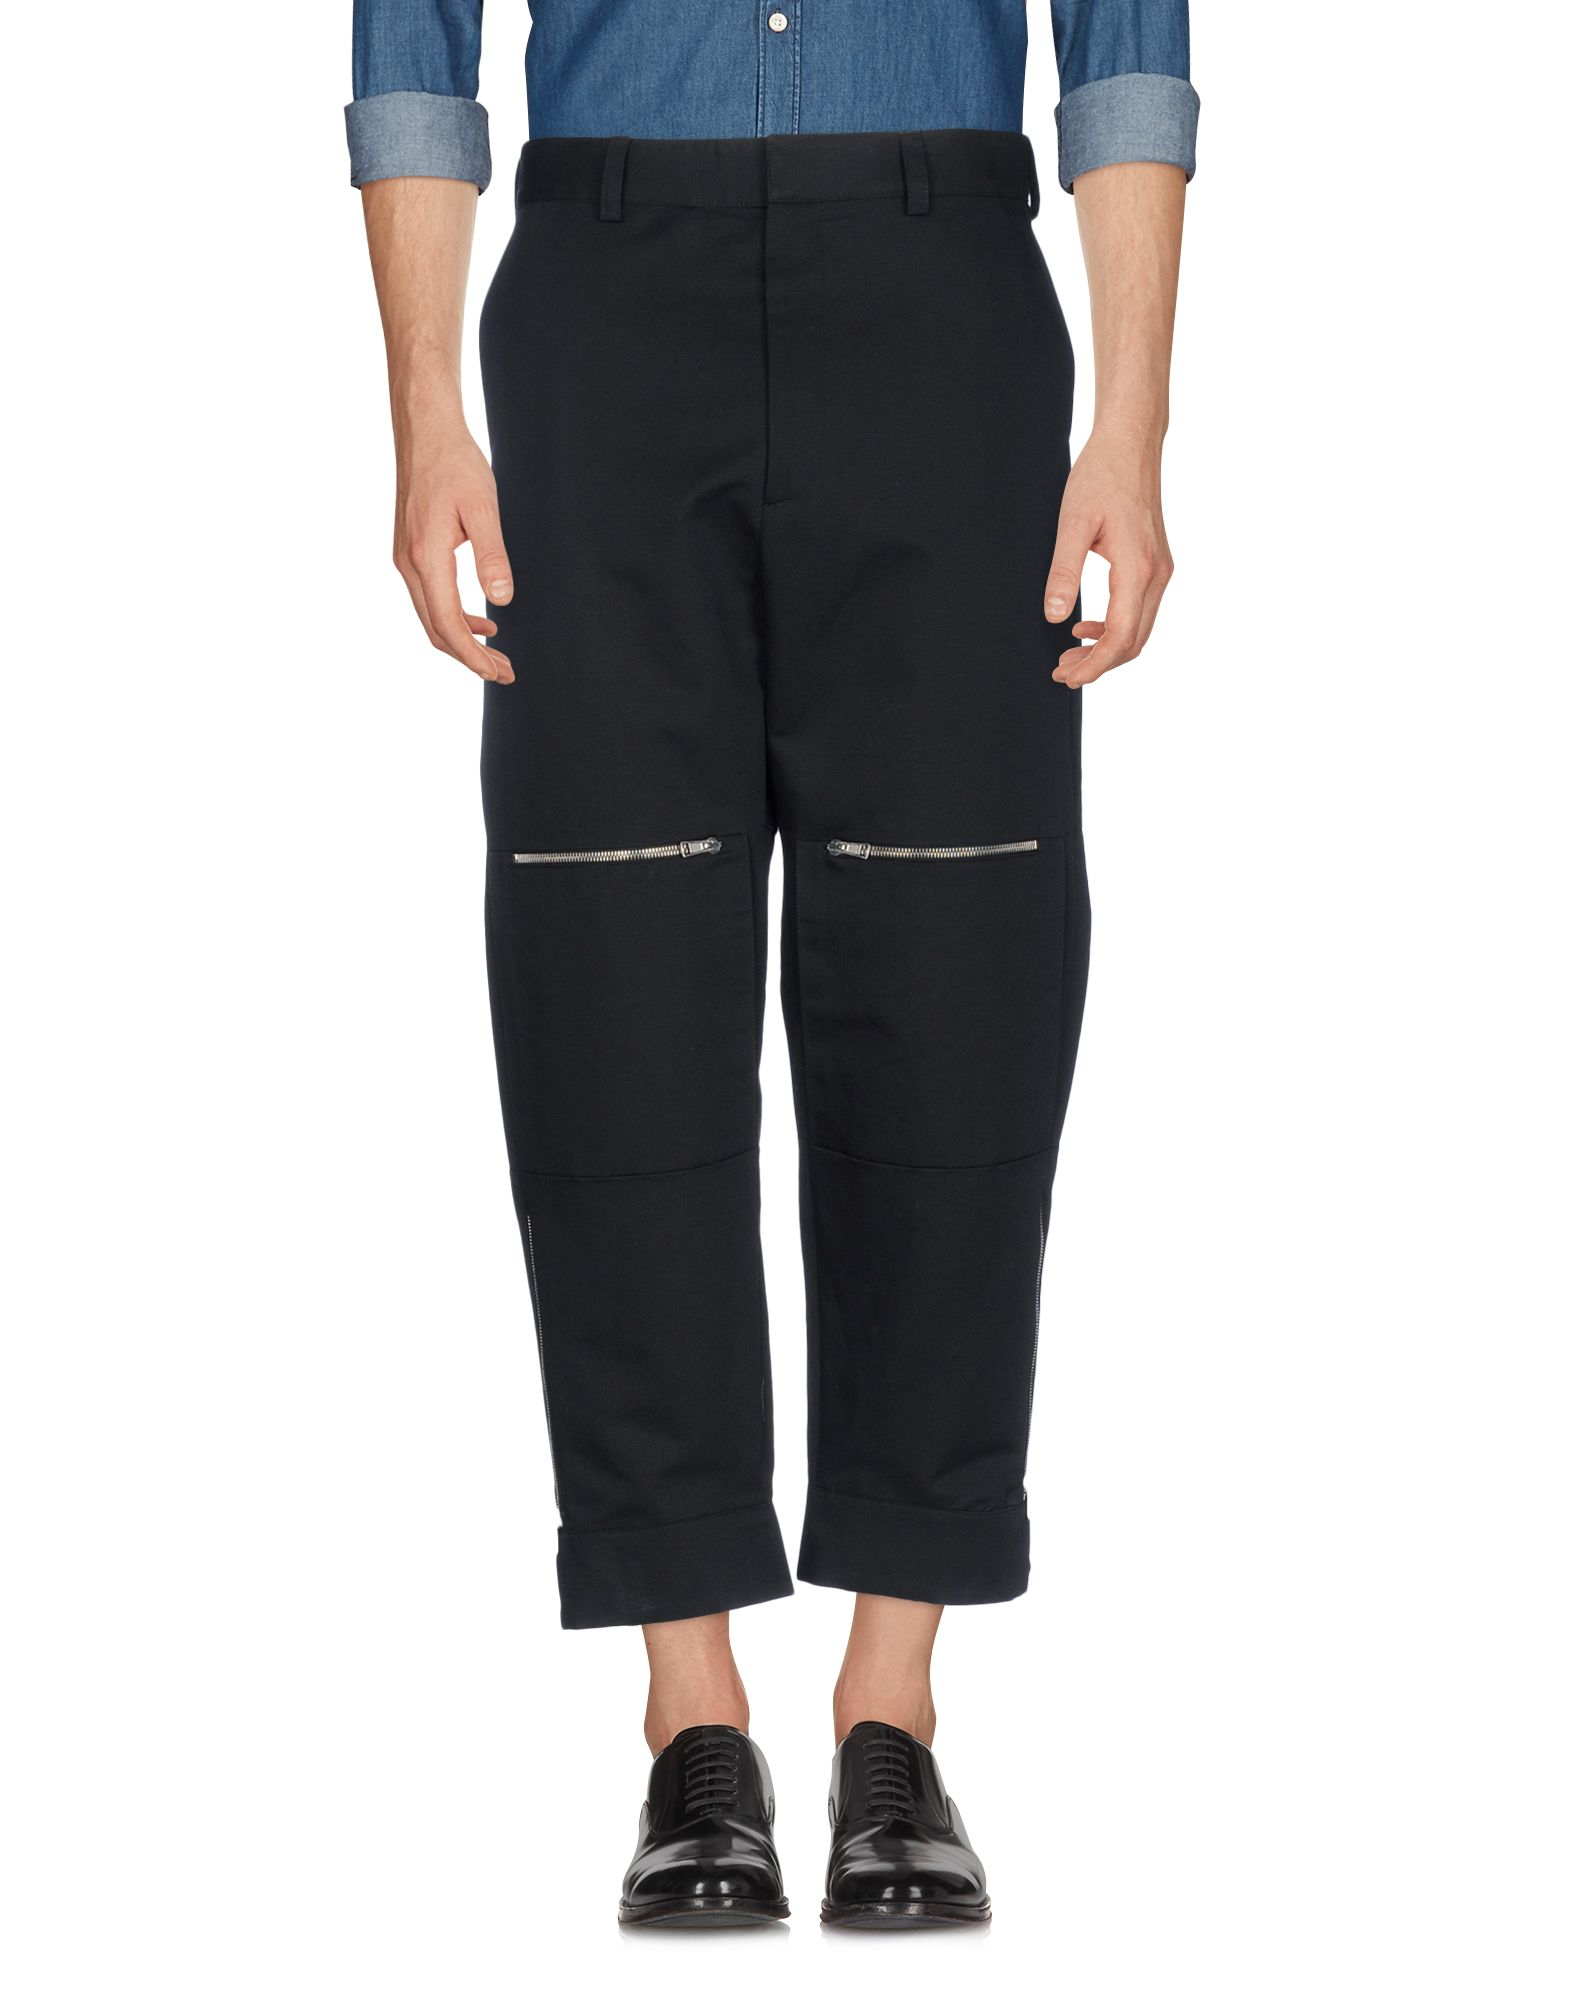 Pantalone Stella Mccartney Uomo - Acquista online su